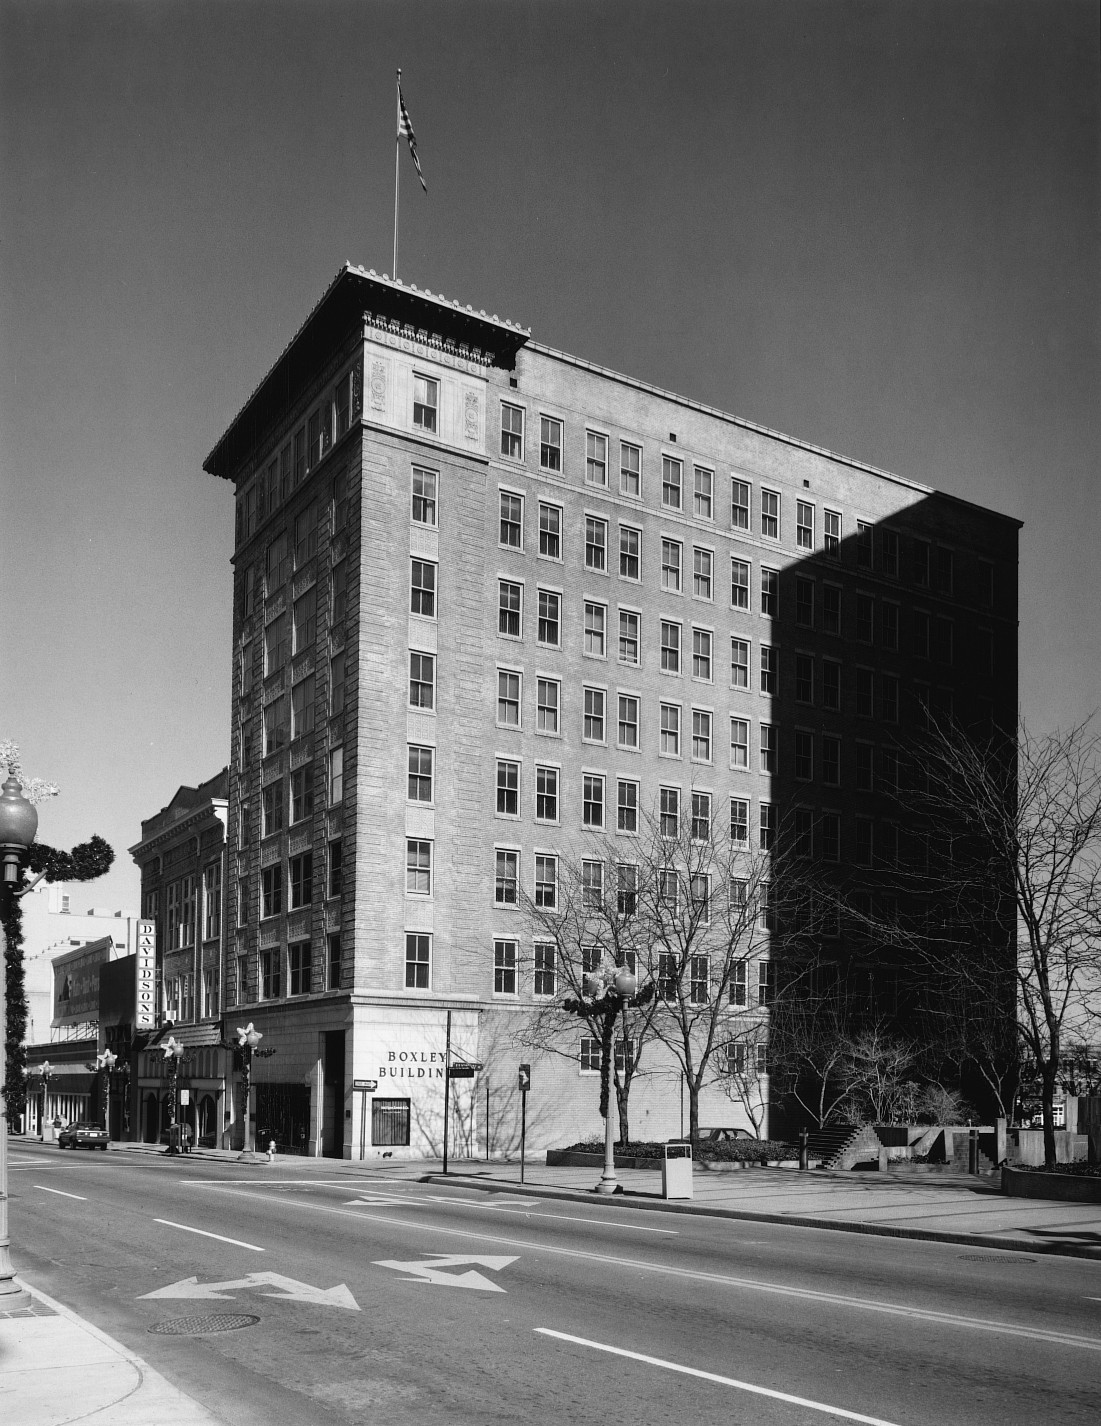 Boxley Building